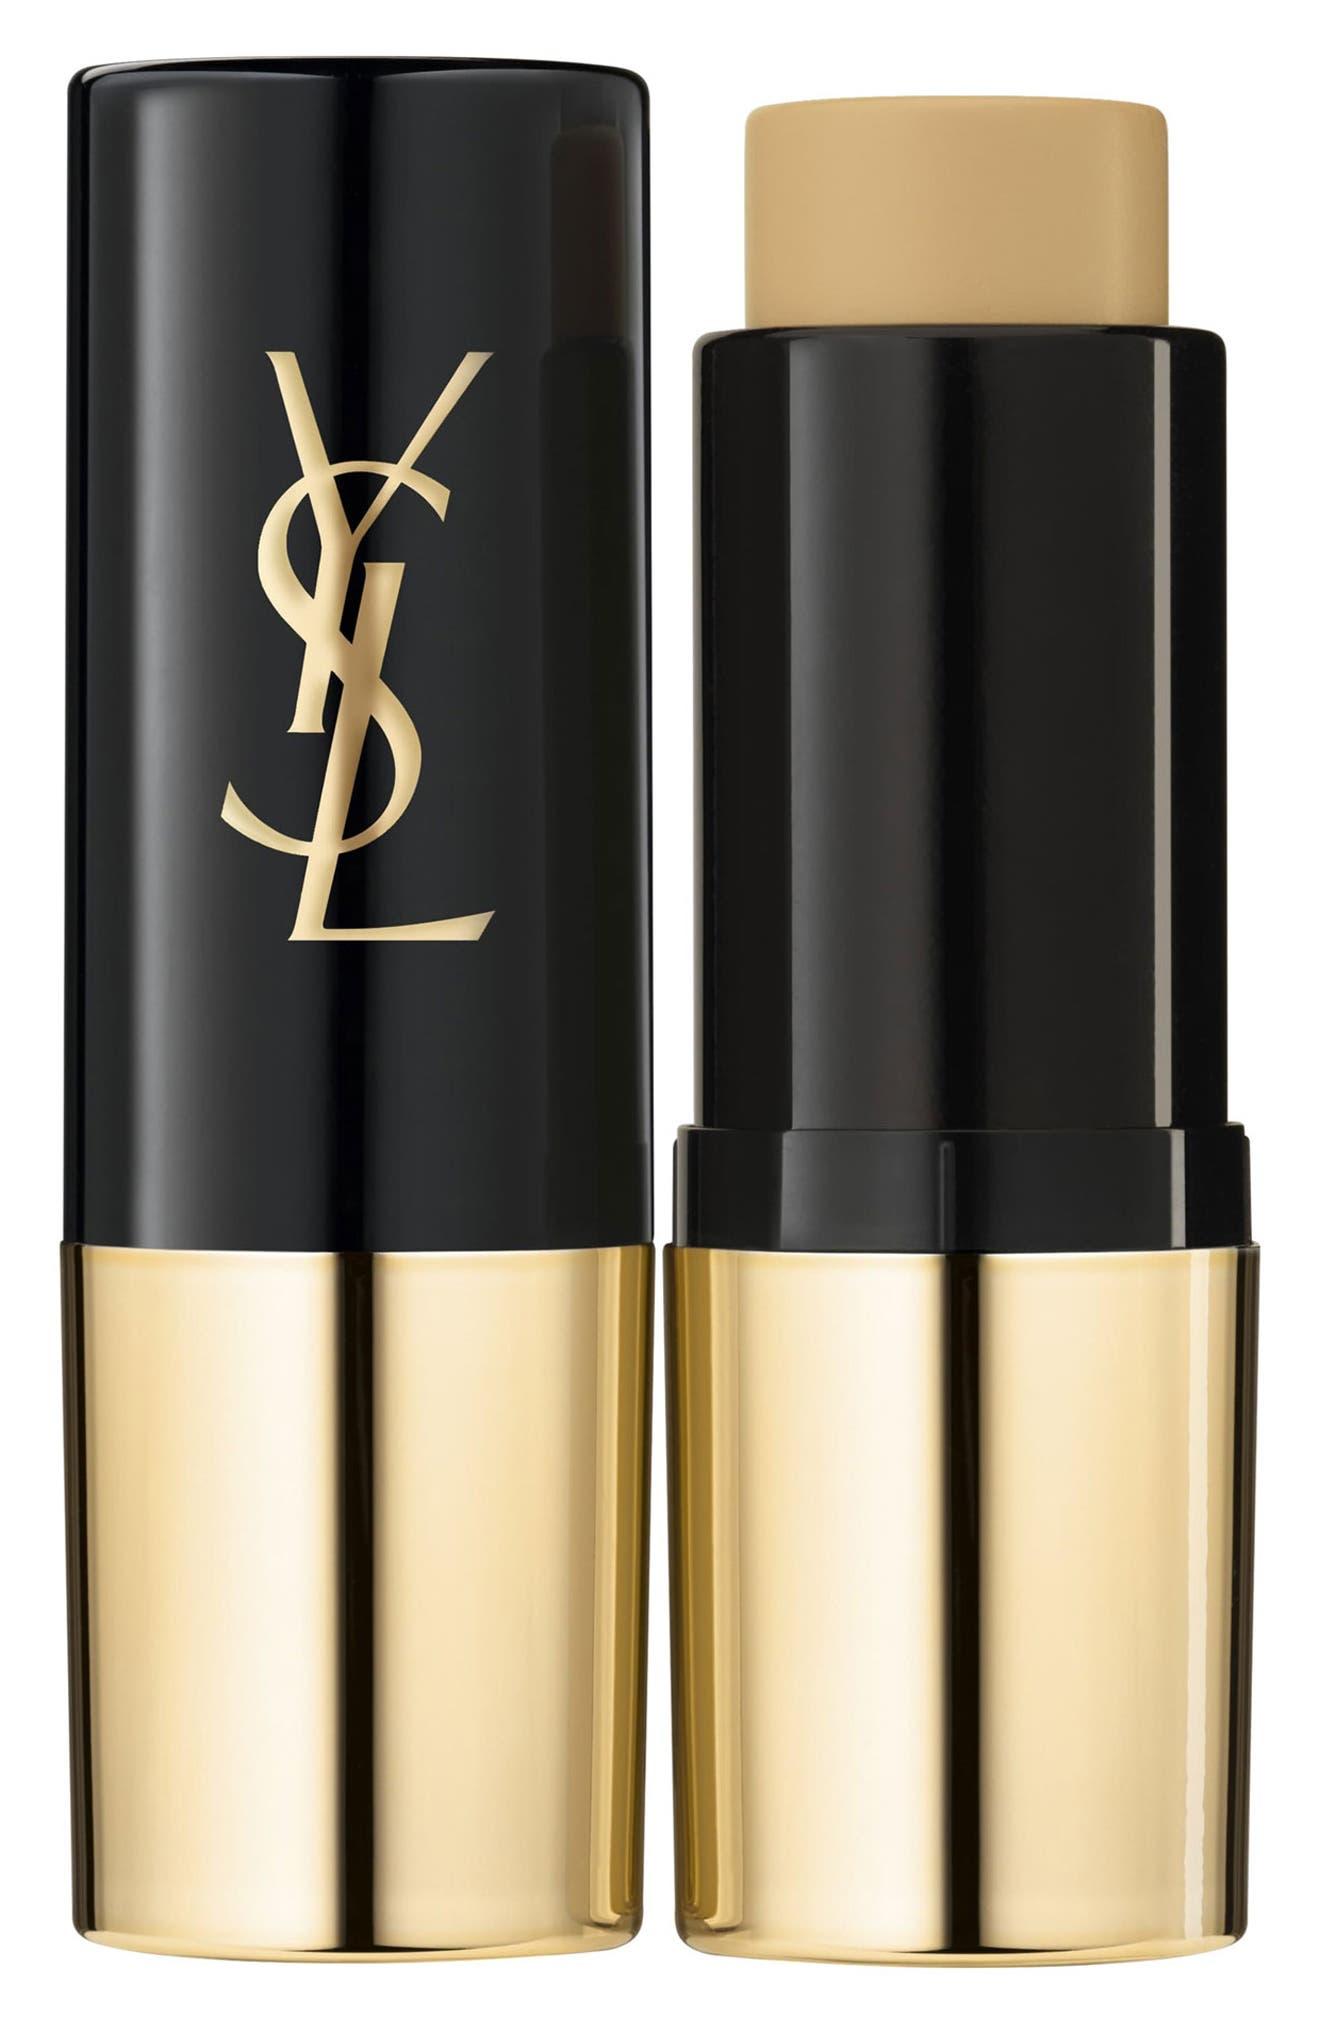 Yves Saint Laurent All Hours Foundation Stick - Bd35 Warm Caramel